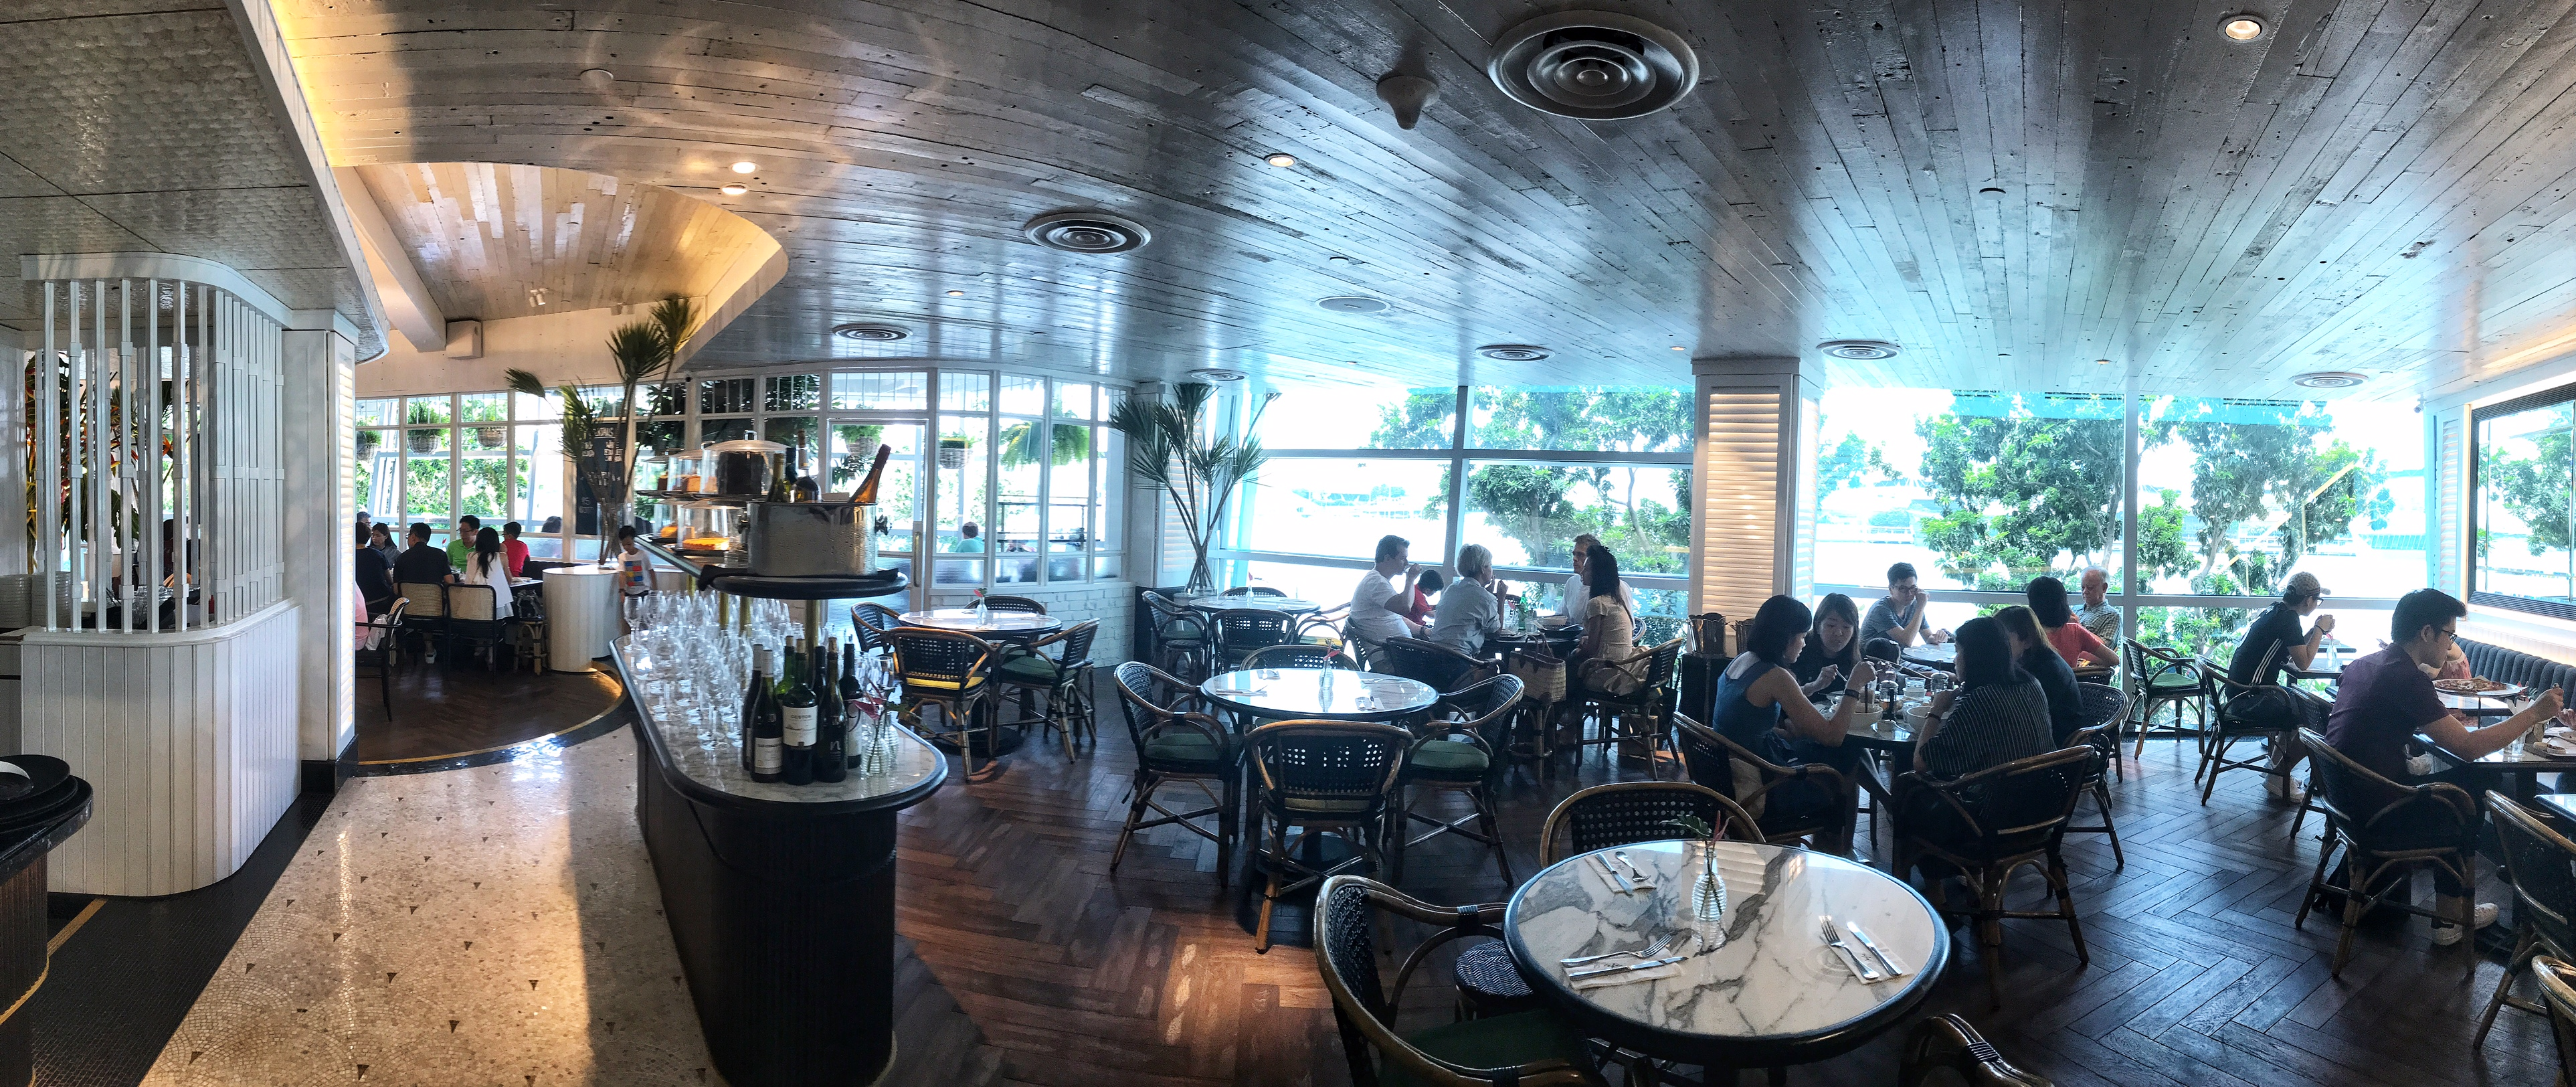 Breakfast Cafe Fullerton